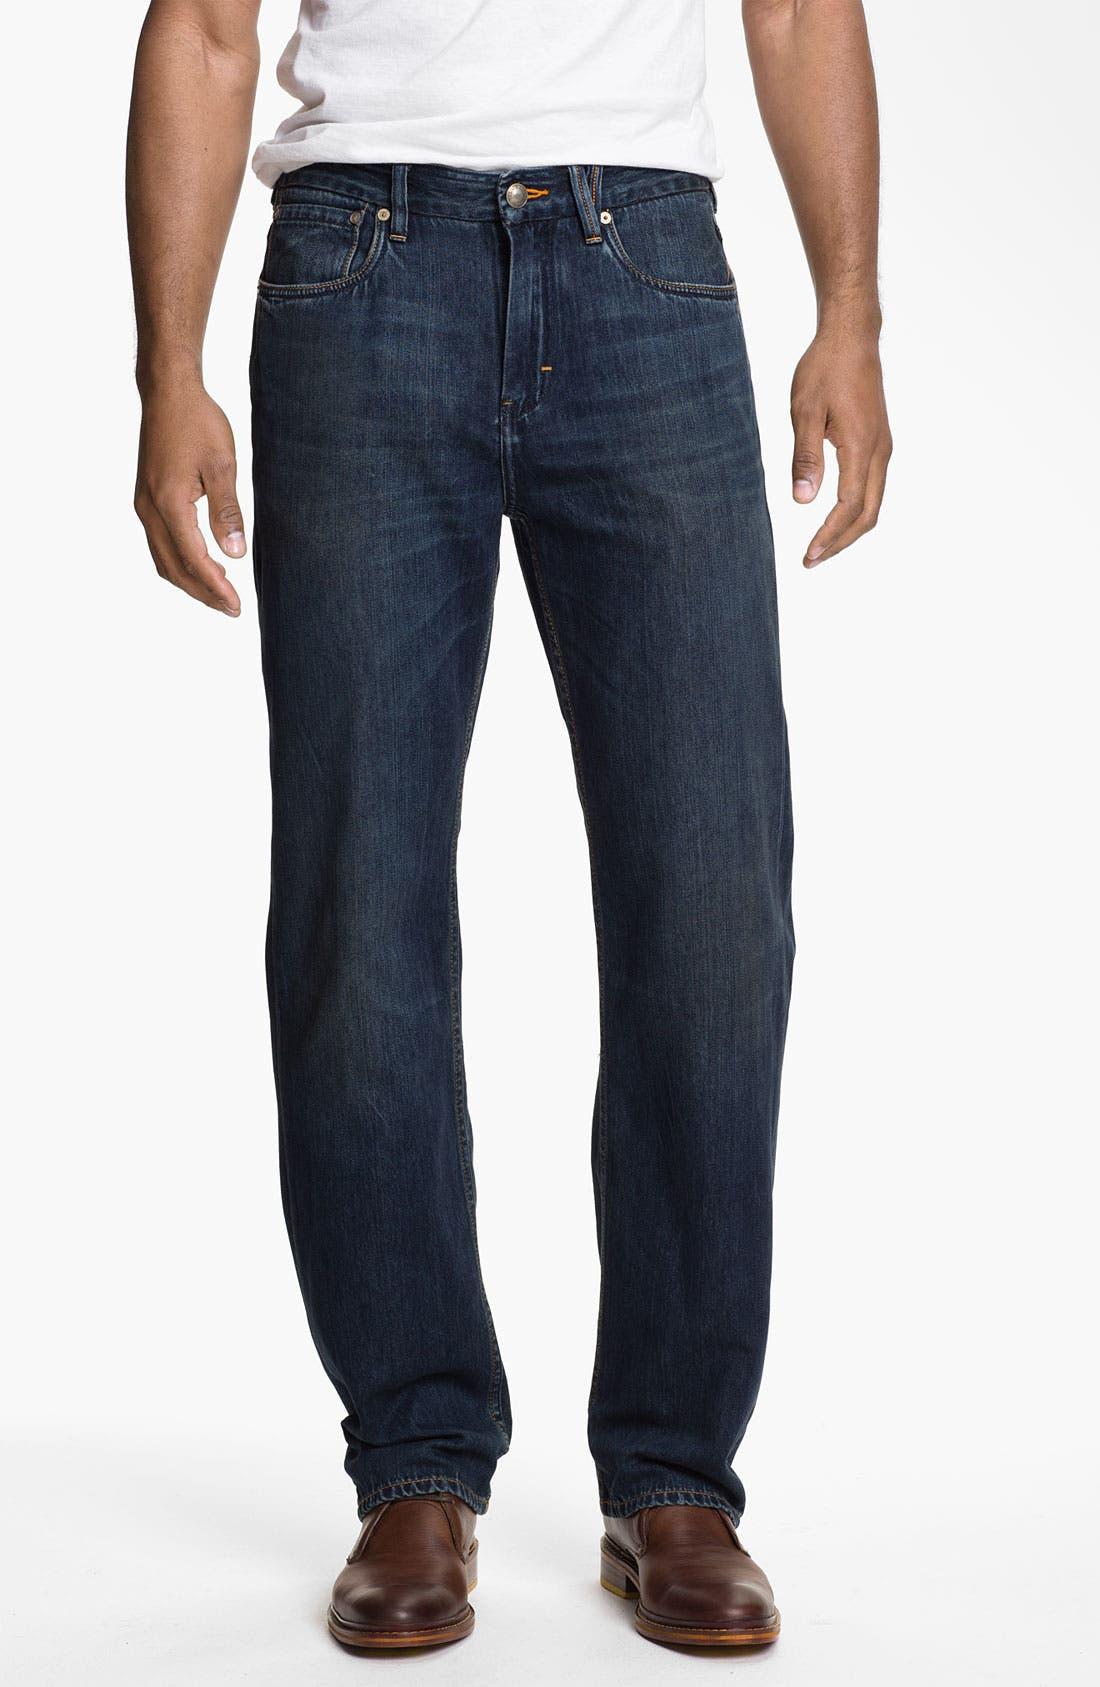 Main Image - Tommy Bahama Denim 'Coastal Island Ease' Straight Leg Jeans (Dark Storm) (Big & Tall)